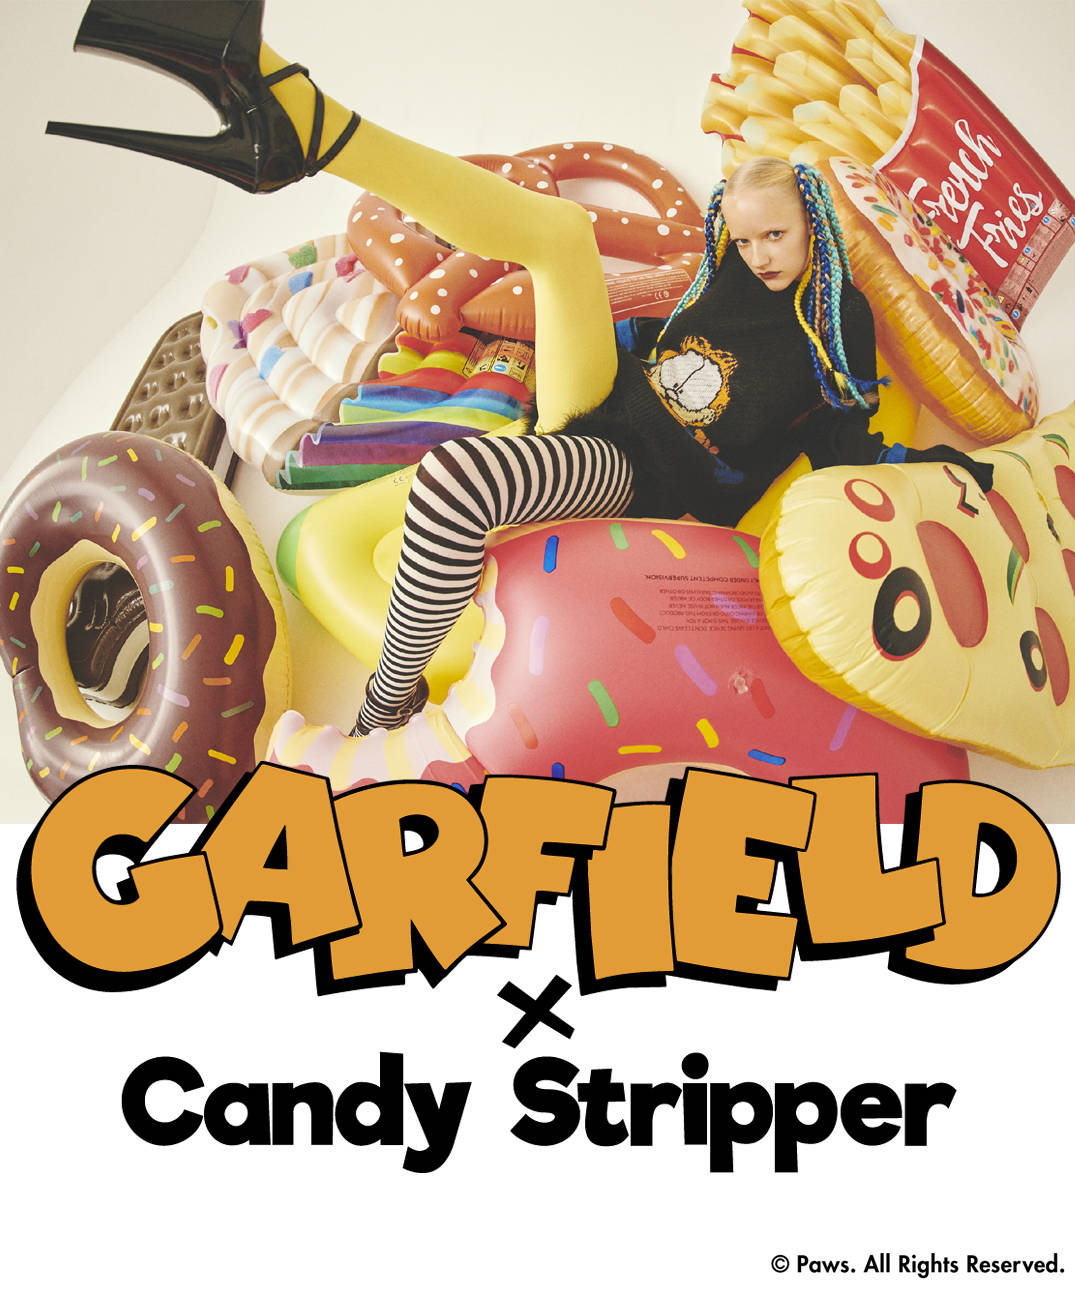 Candy Stripper(キャンディストリッパー )のショップニュース「【GARFIELD×Candy Stripper】コラボアイテム先行予約スタート!」